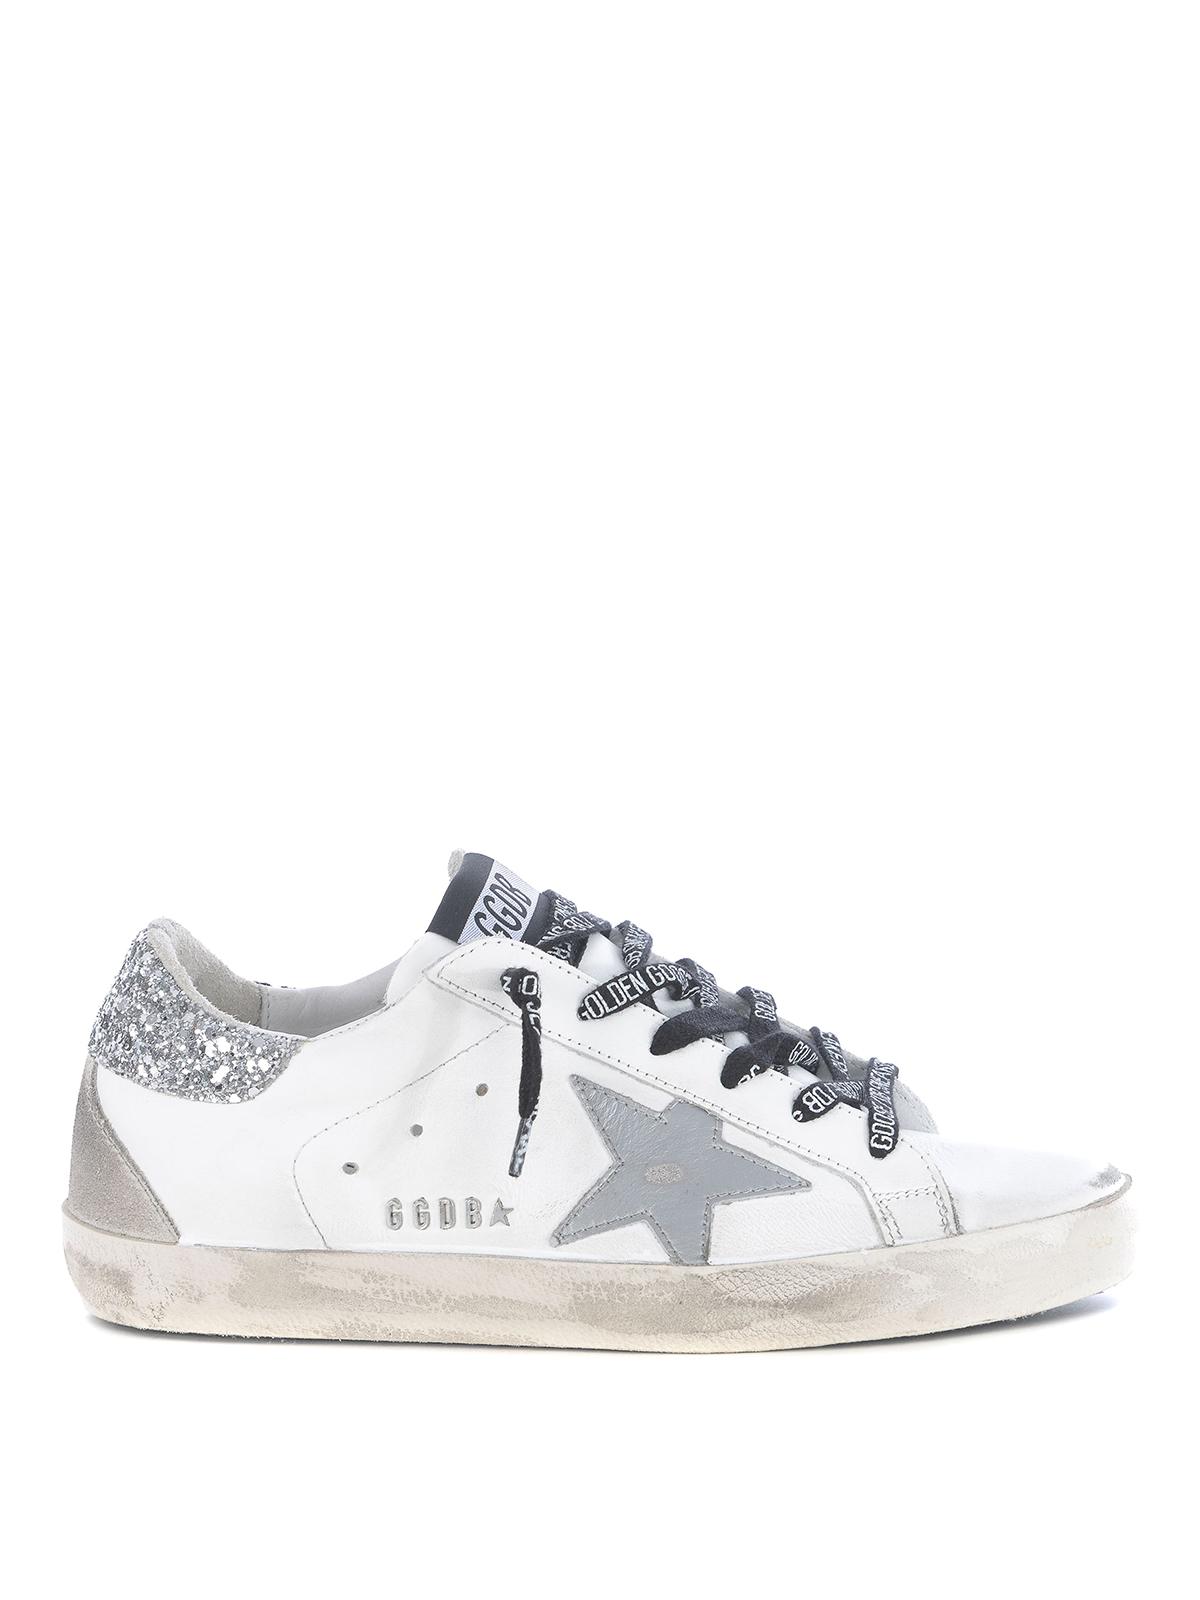 Superstar glitter heel tab sneakers